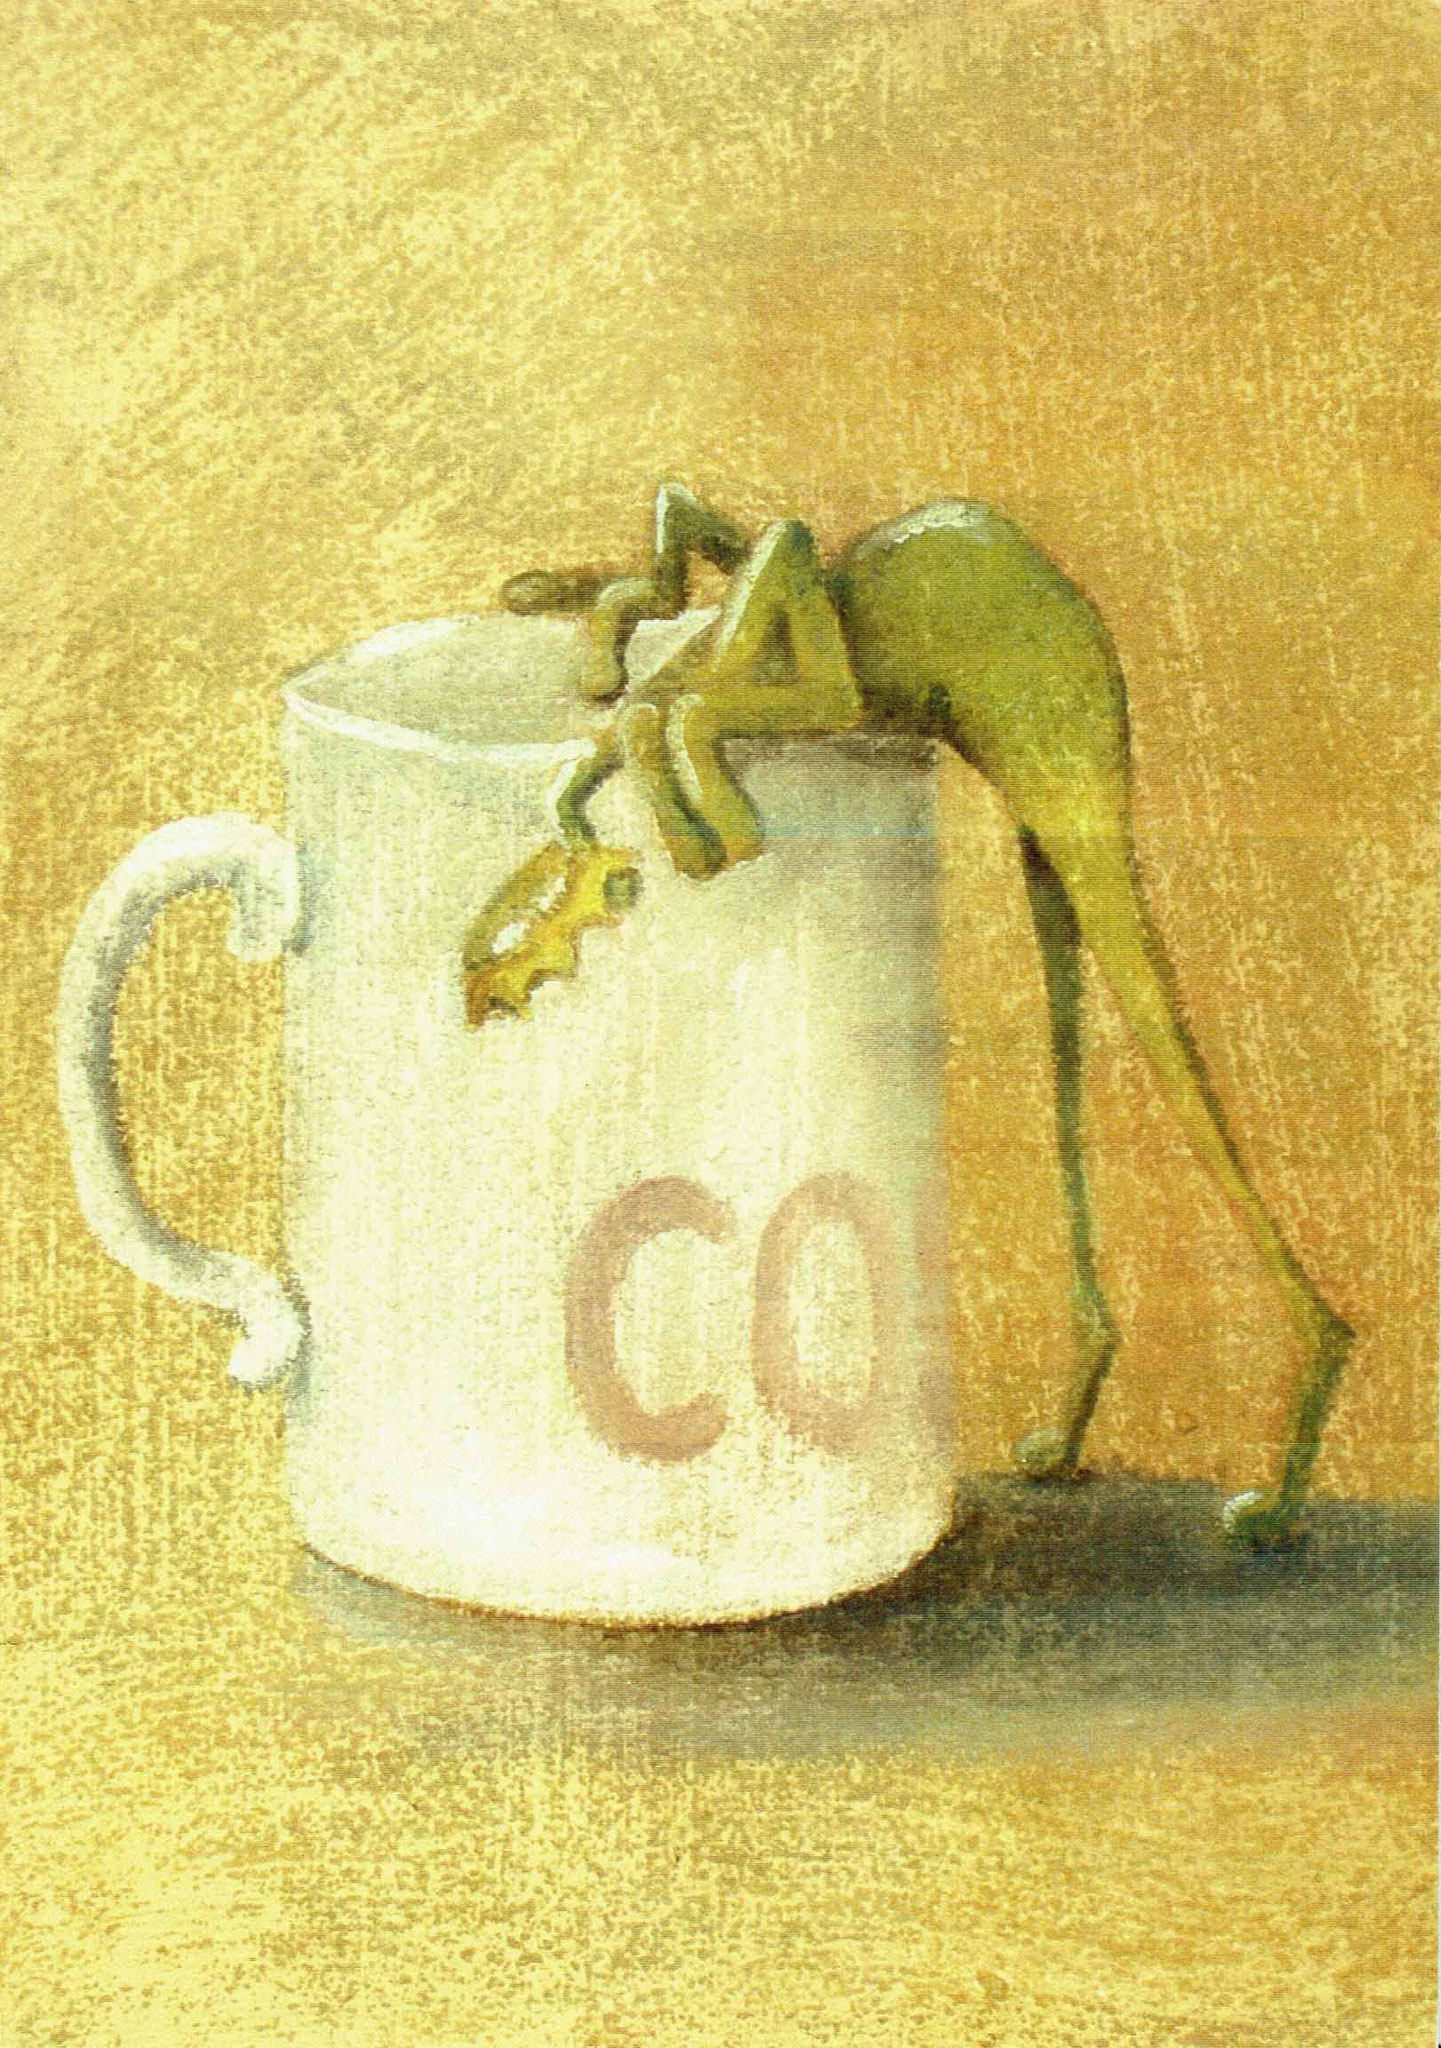 Frosch Coffee - Öl auf Leinwand 30 x 40 cm